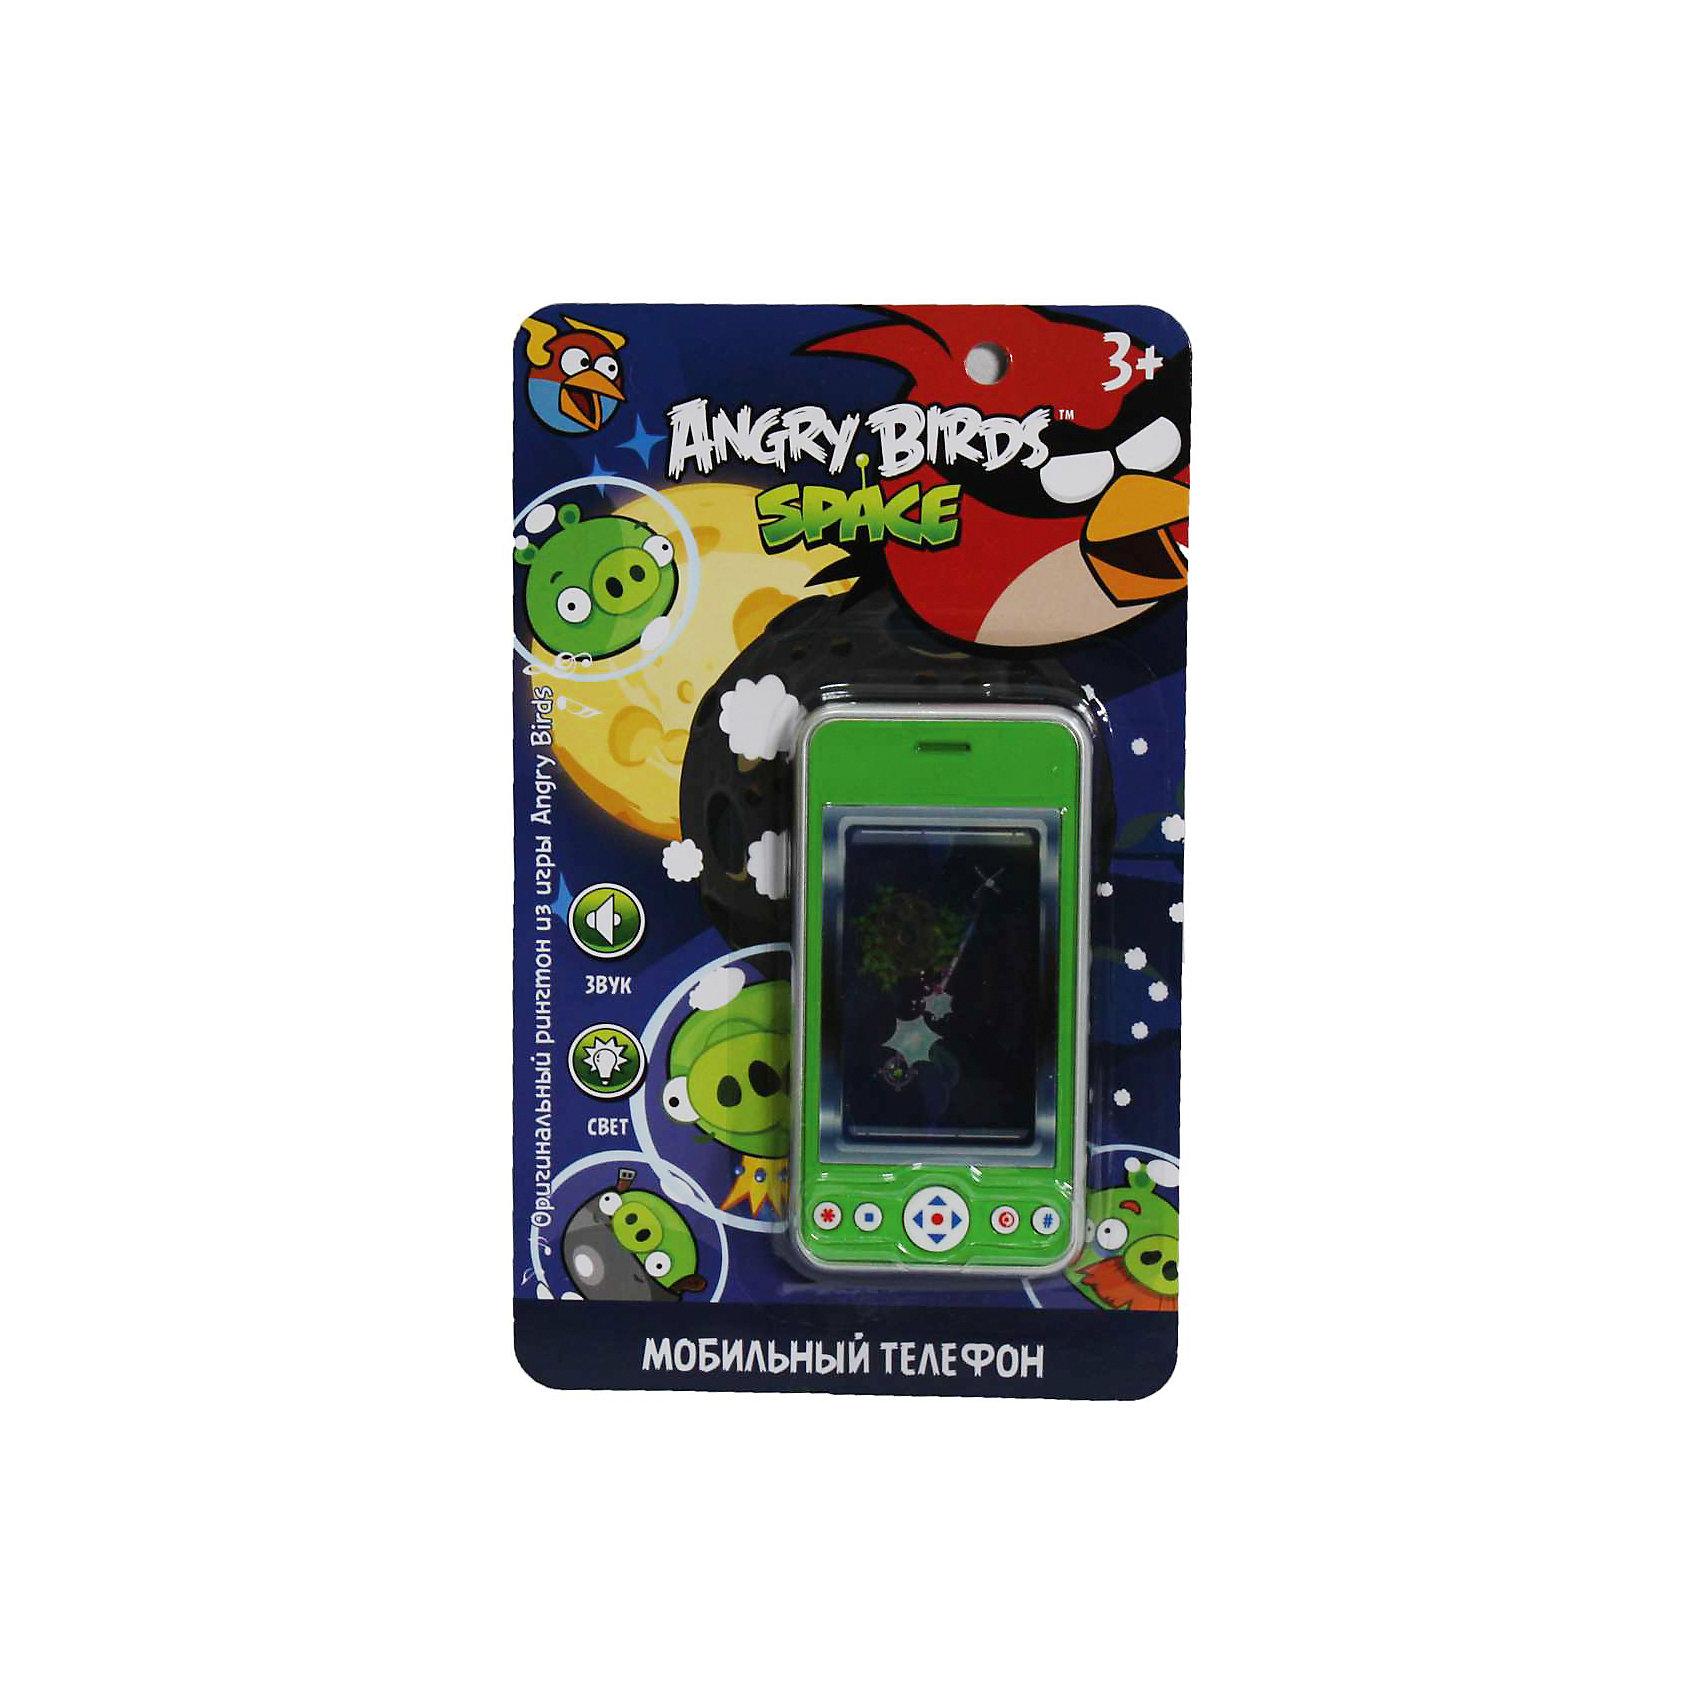 - Телефон со стилусом Айфон, Angry Birds, 1toy айфон 4 москве дешево